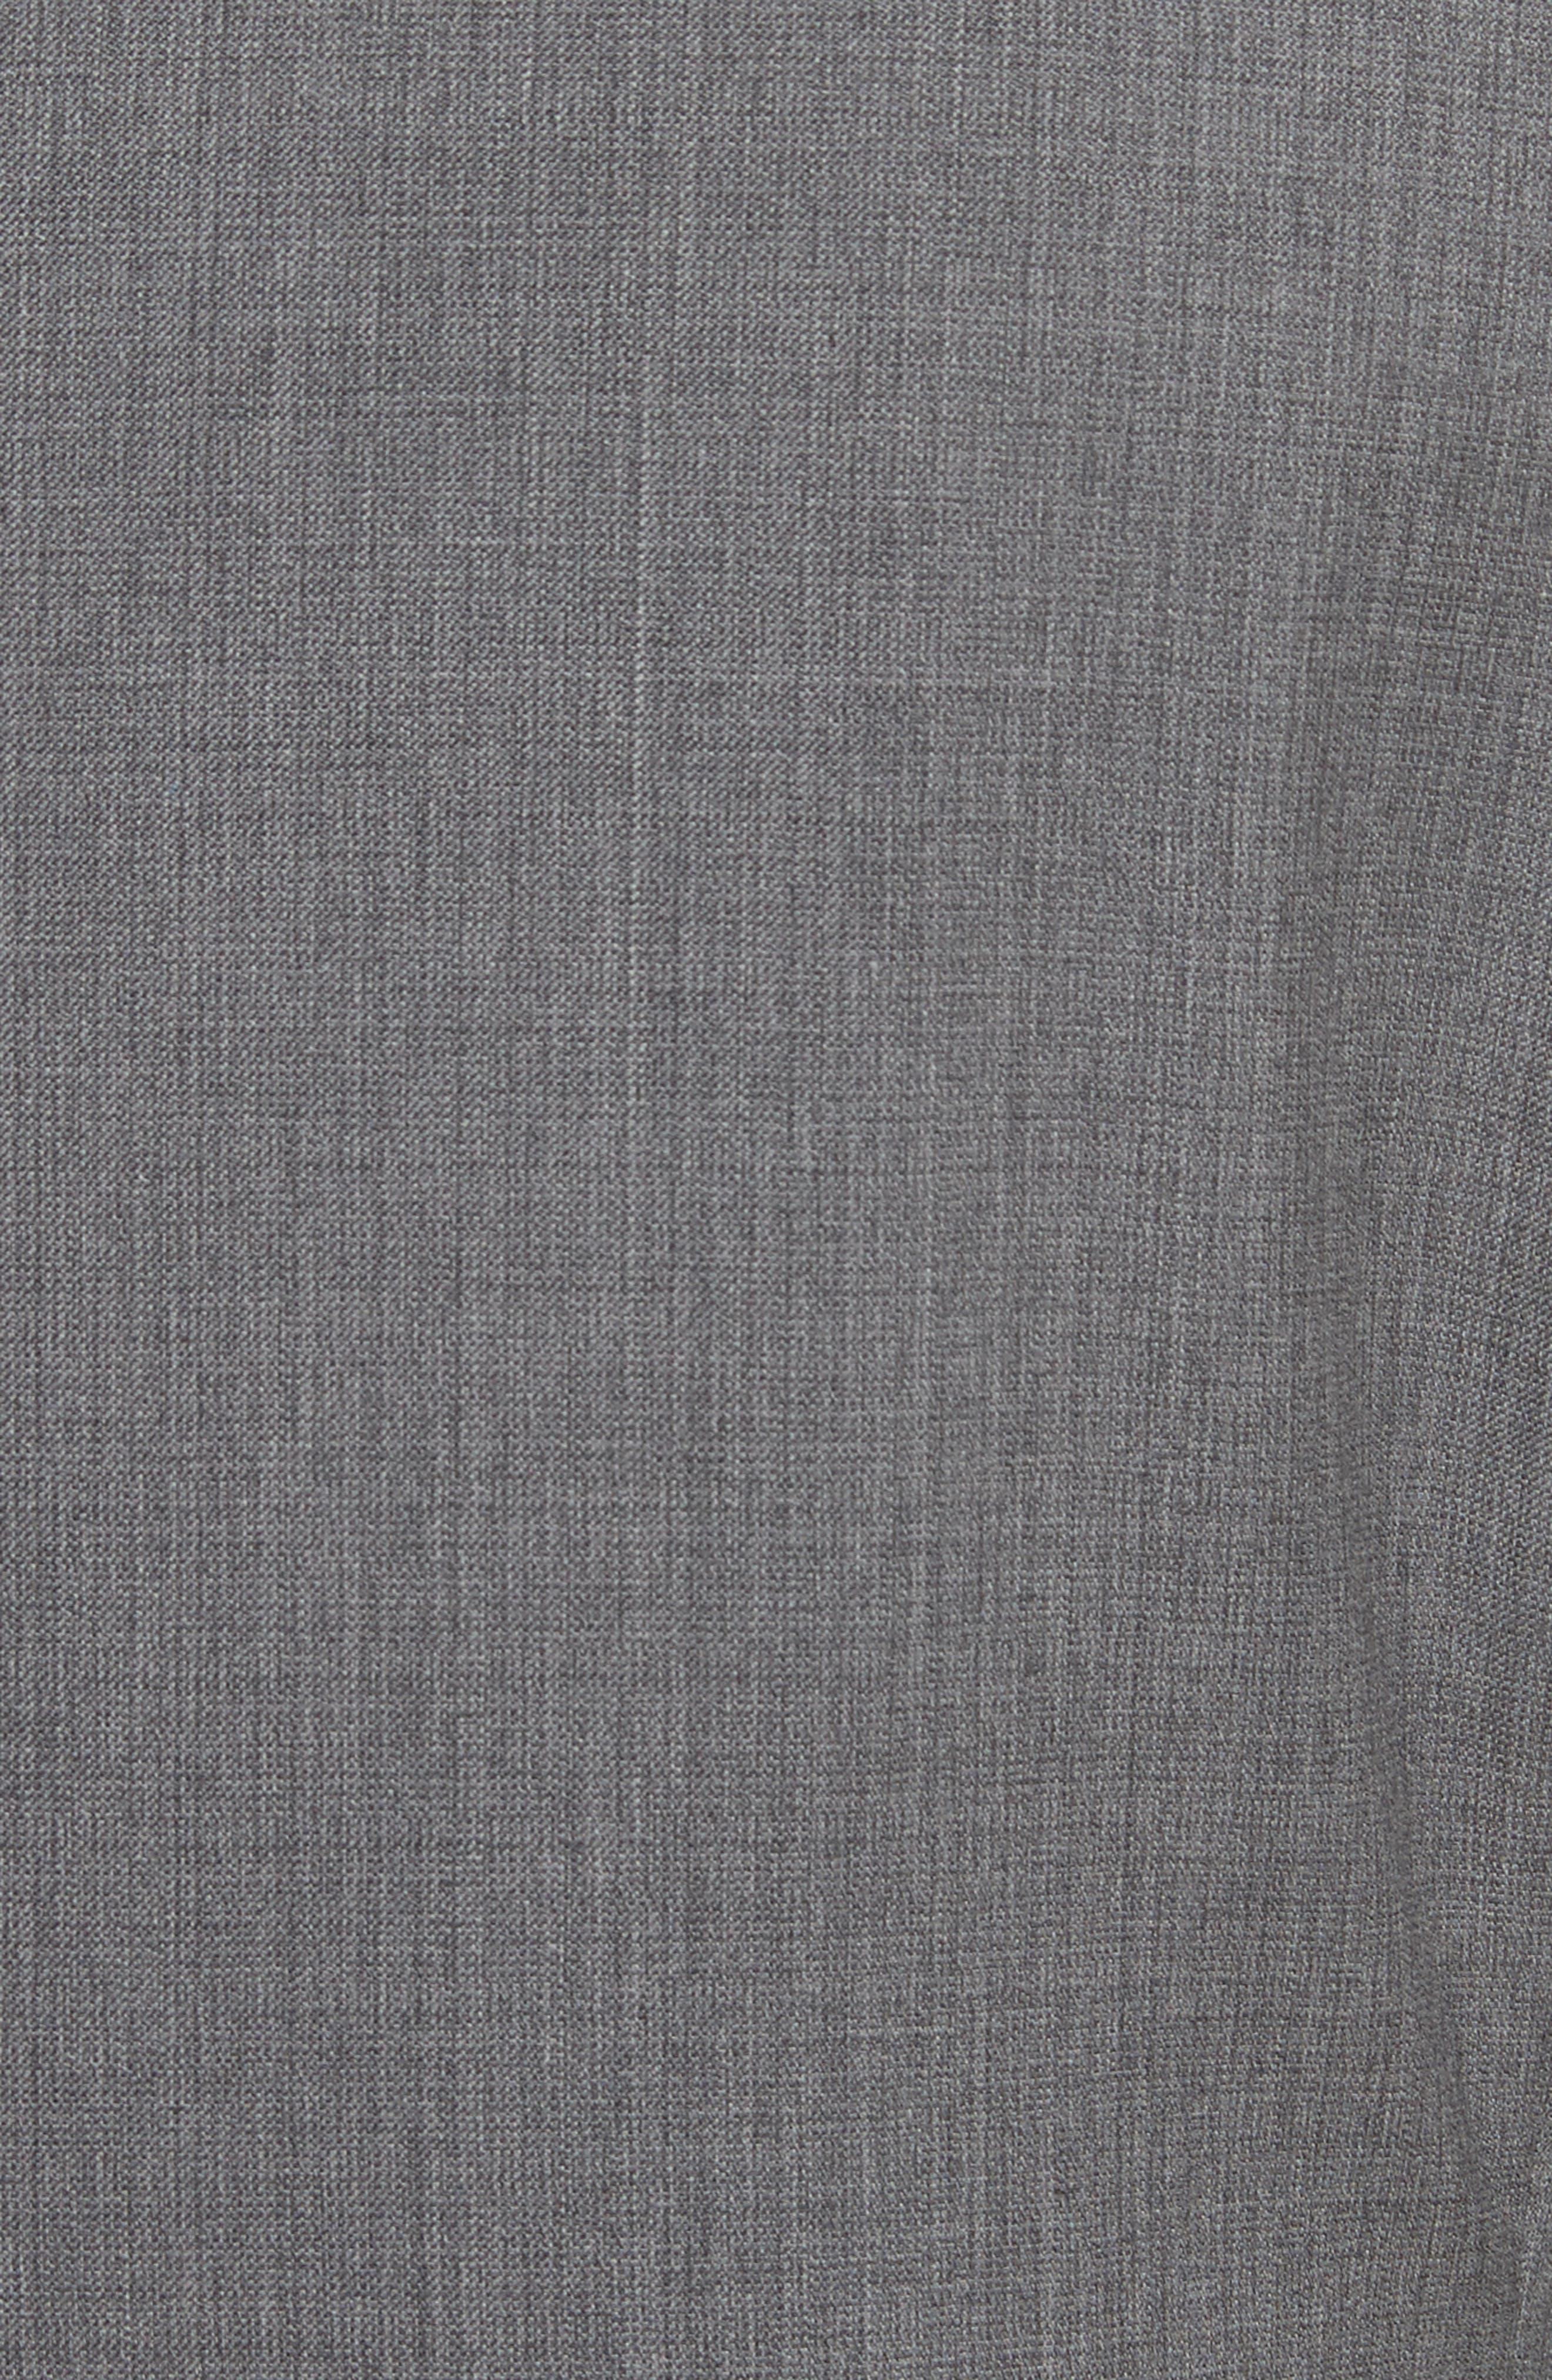 Trim Fit Sharkskin Wool Suit,                             Alternate thumbnail 7, color,                             Grey